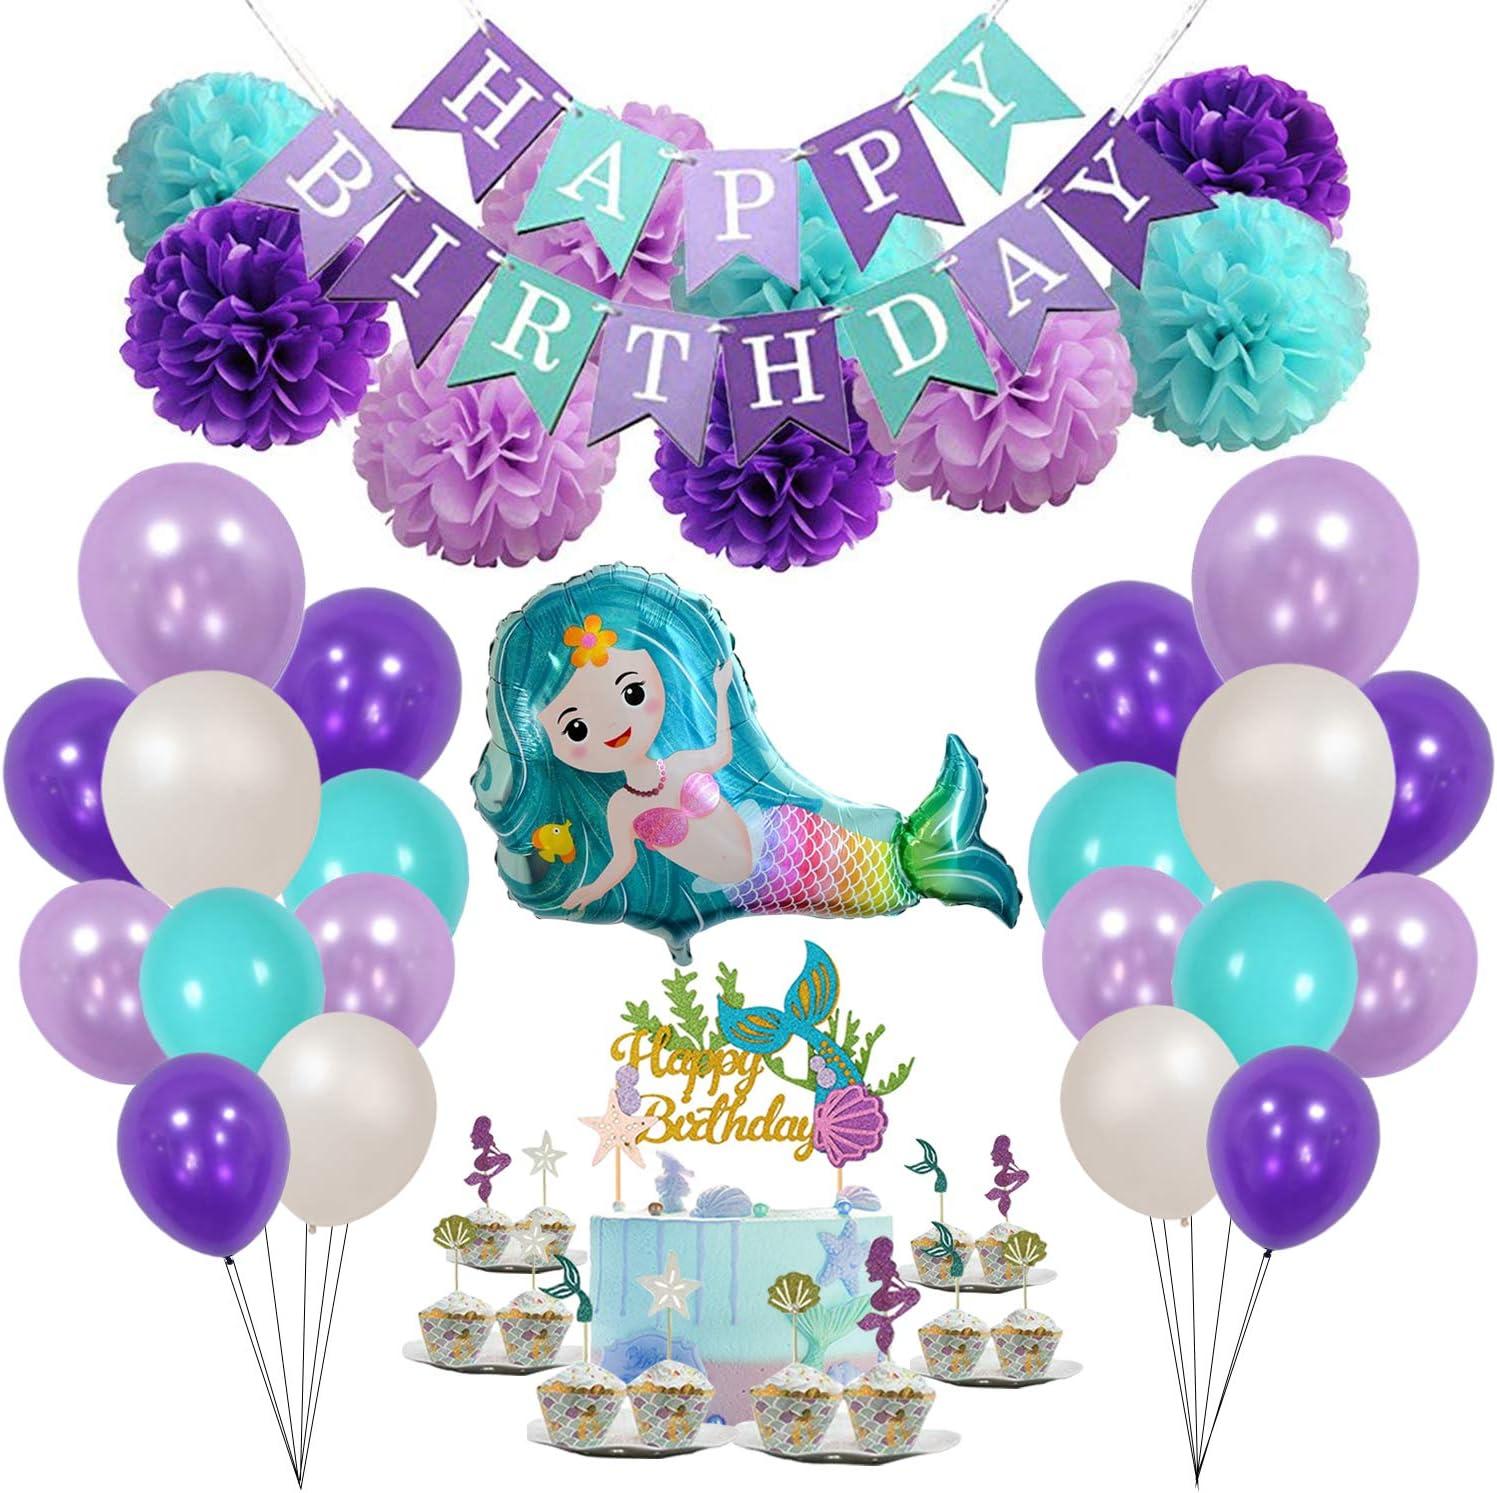 Mermaid Party Supplies, including Mermaid Cake Topper, Mermaid Balloons, Mermaid Cupcake Toppers, Happy Birthday Banner, Paper Pom Poms, White/Lavender/Tiffany Blue/Deep Purple Balloons